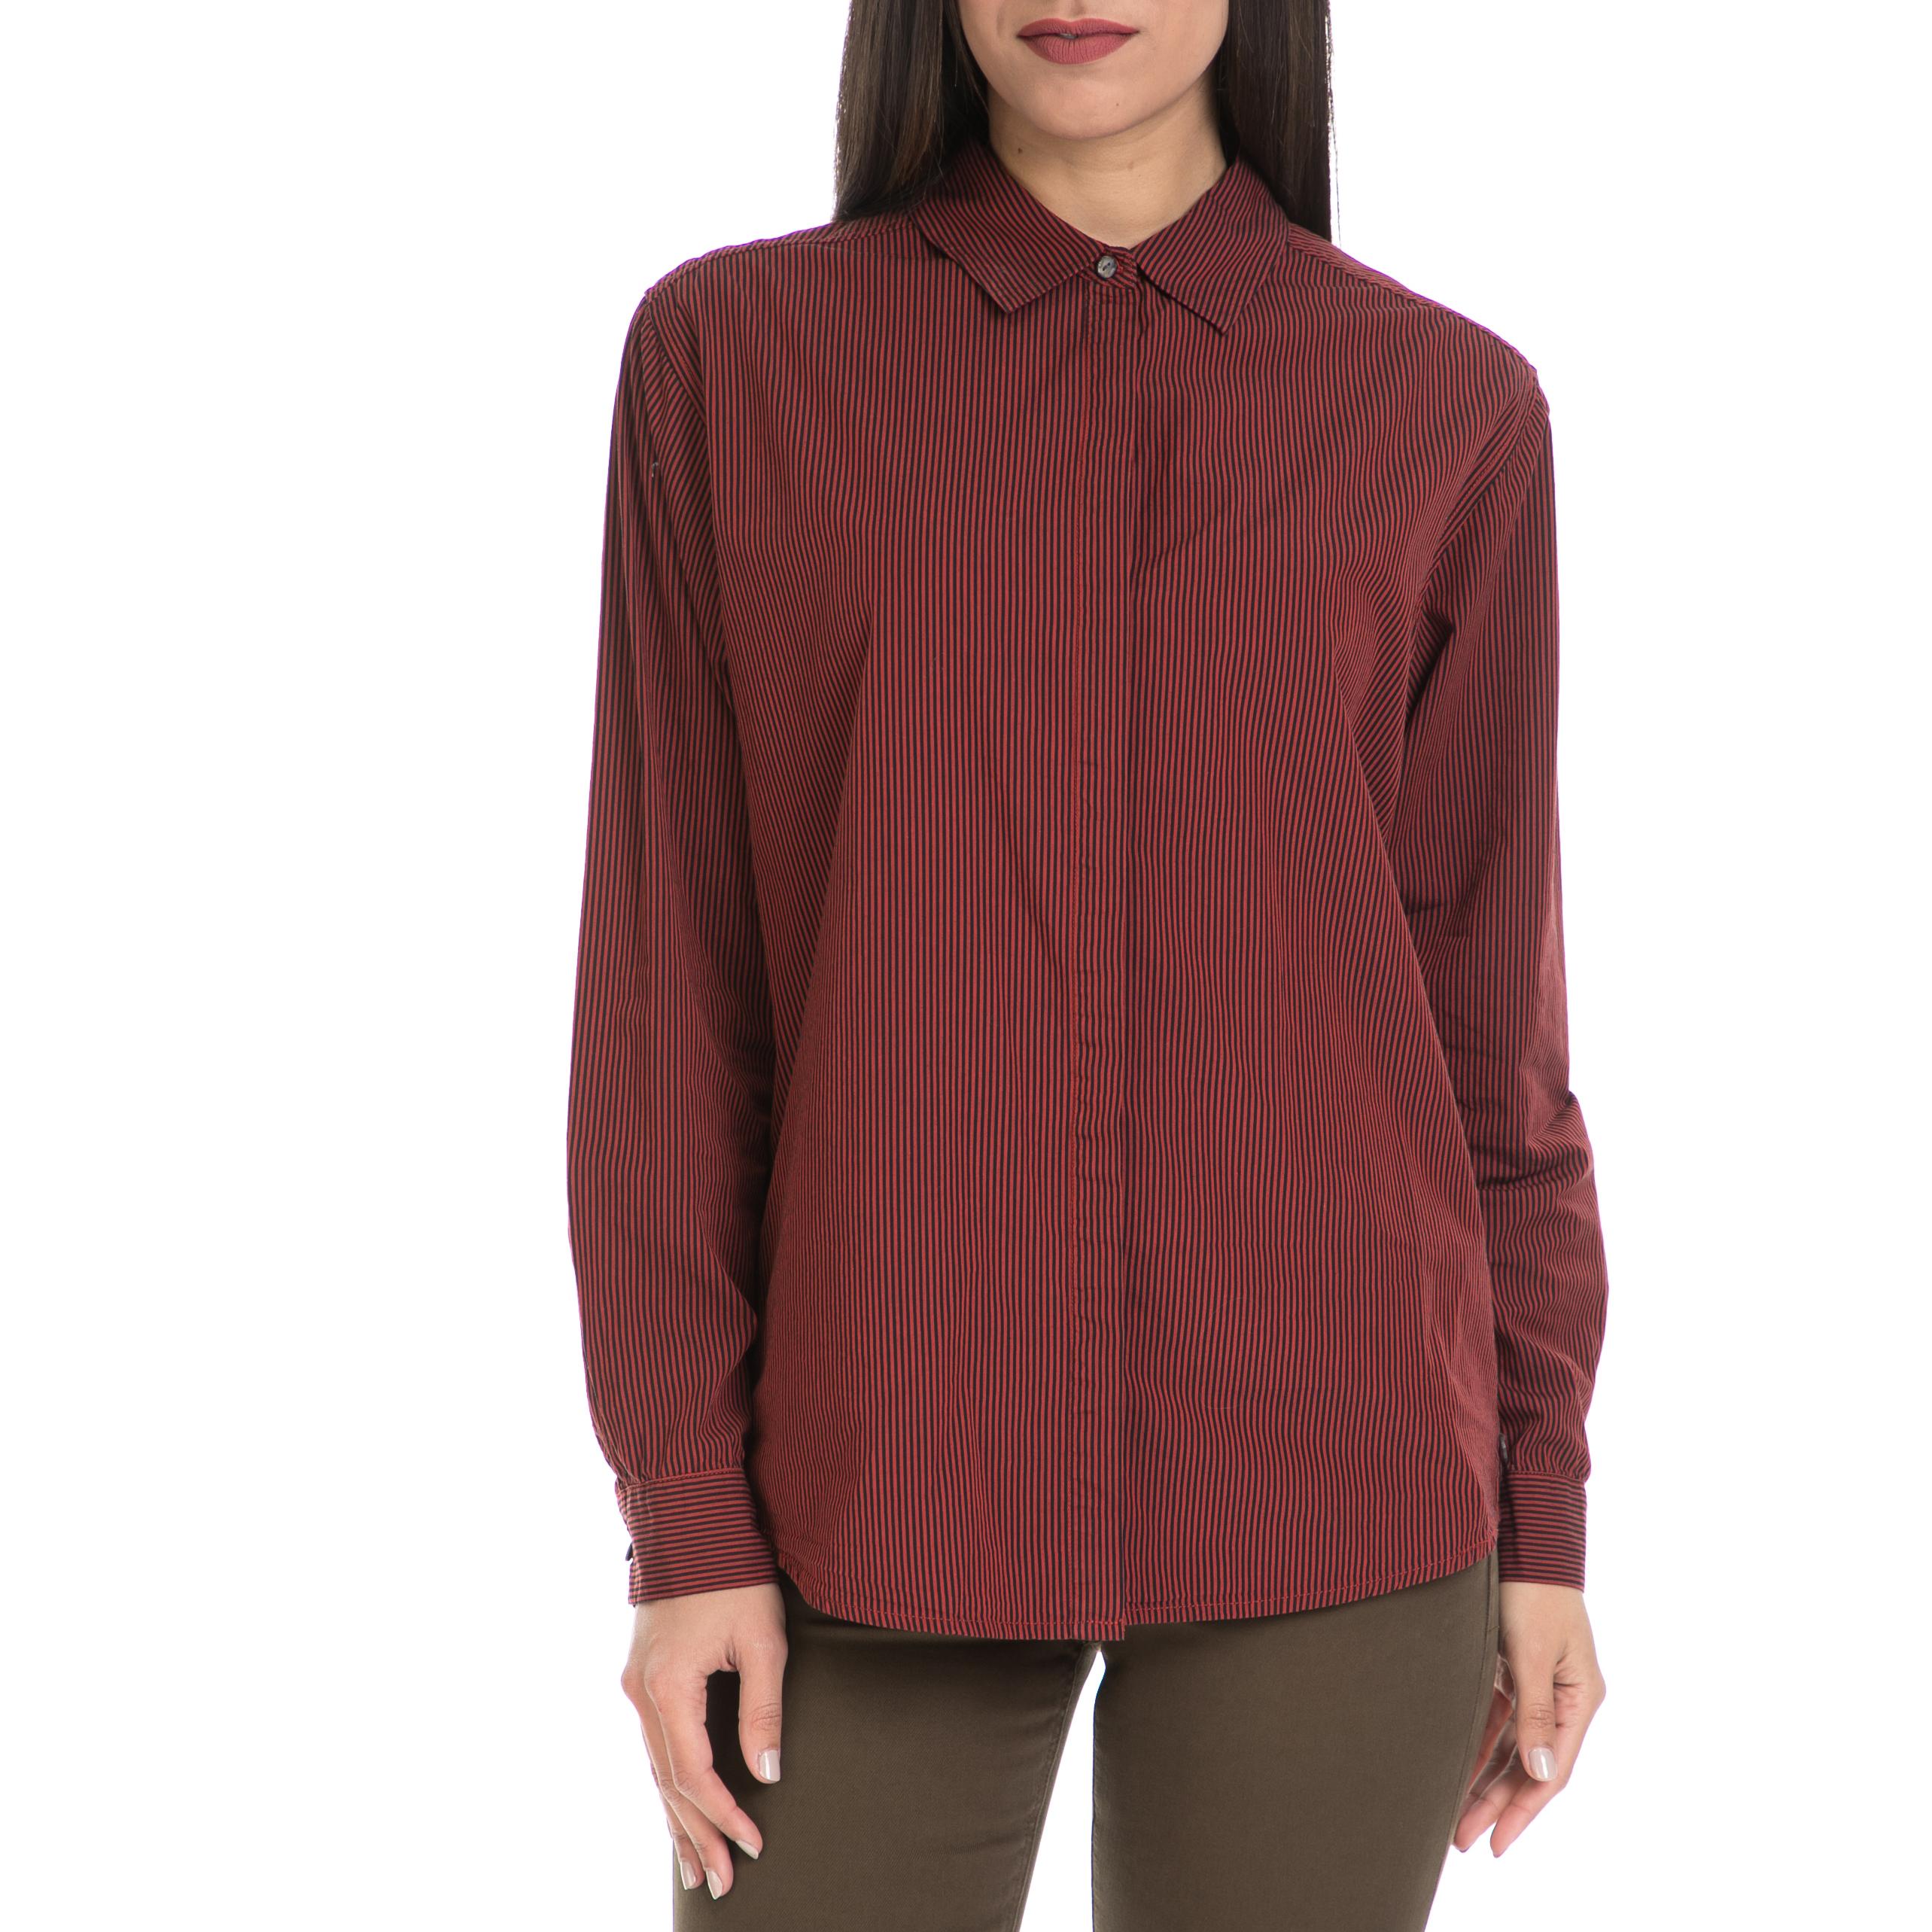 SCOTCH & SODA - Γυναικείο πουκάμισο MAISON SCOTCH μπορντό γυναικεία ρούχα πουκάμισα μακρυμάνικα